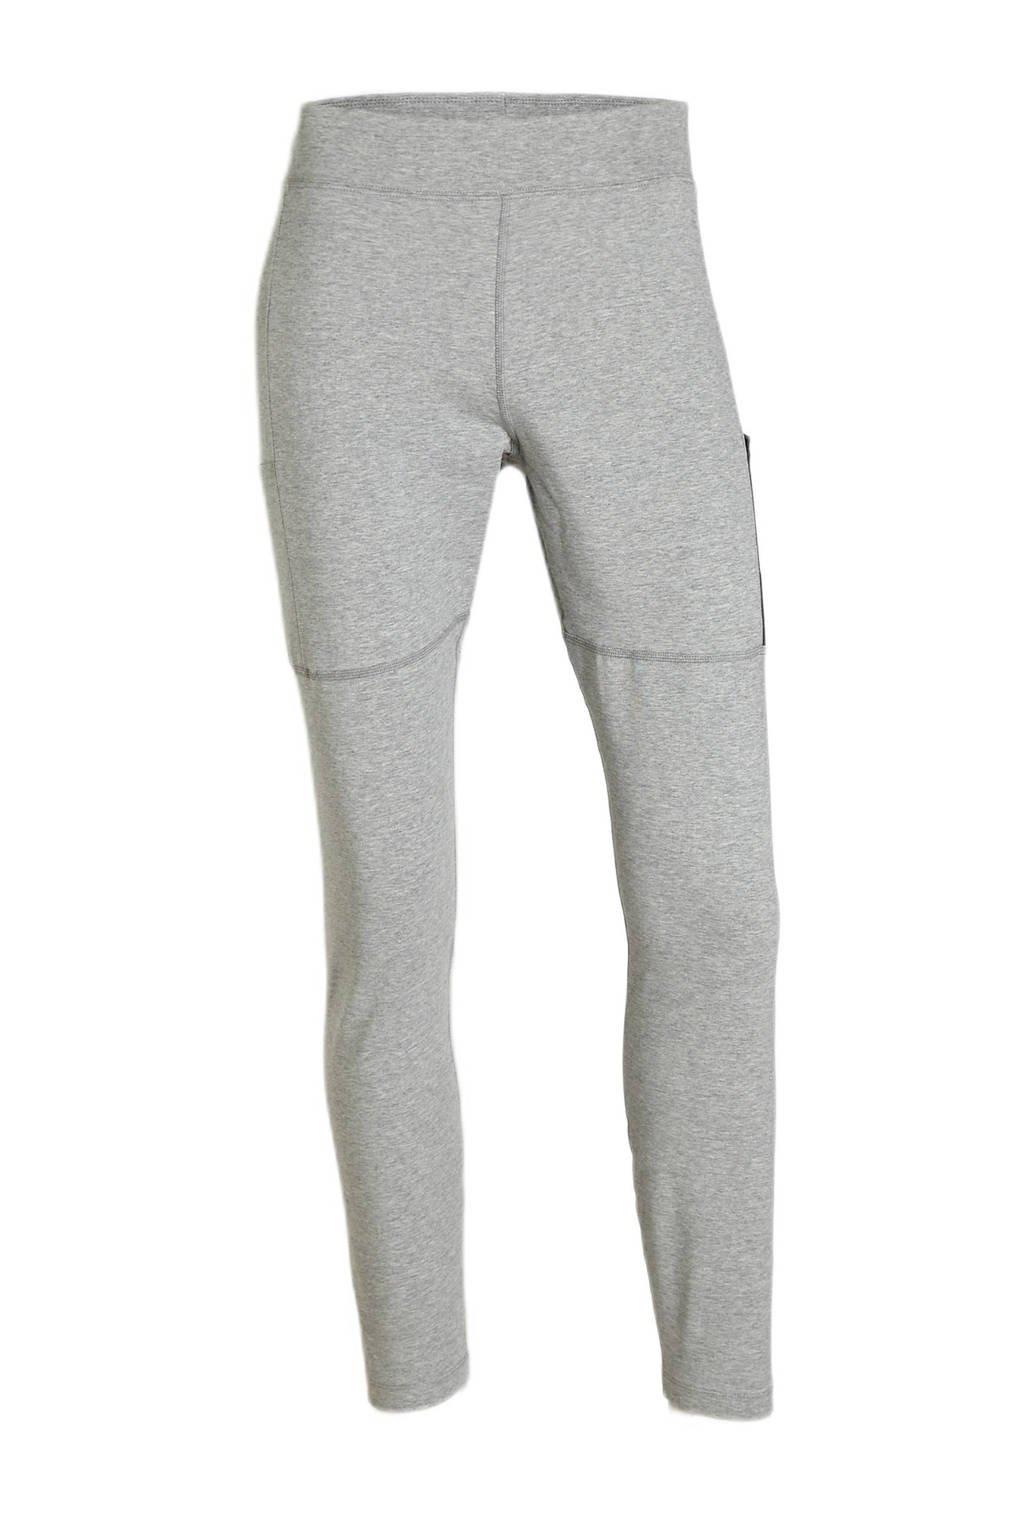 Nike sportlegging grijs/zwart, Grijs/zwart